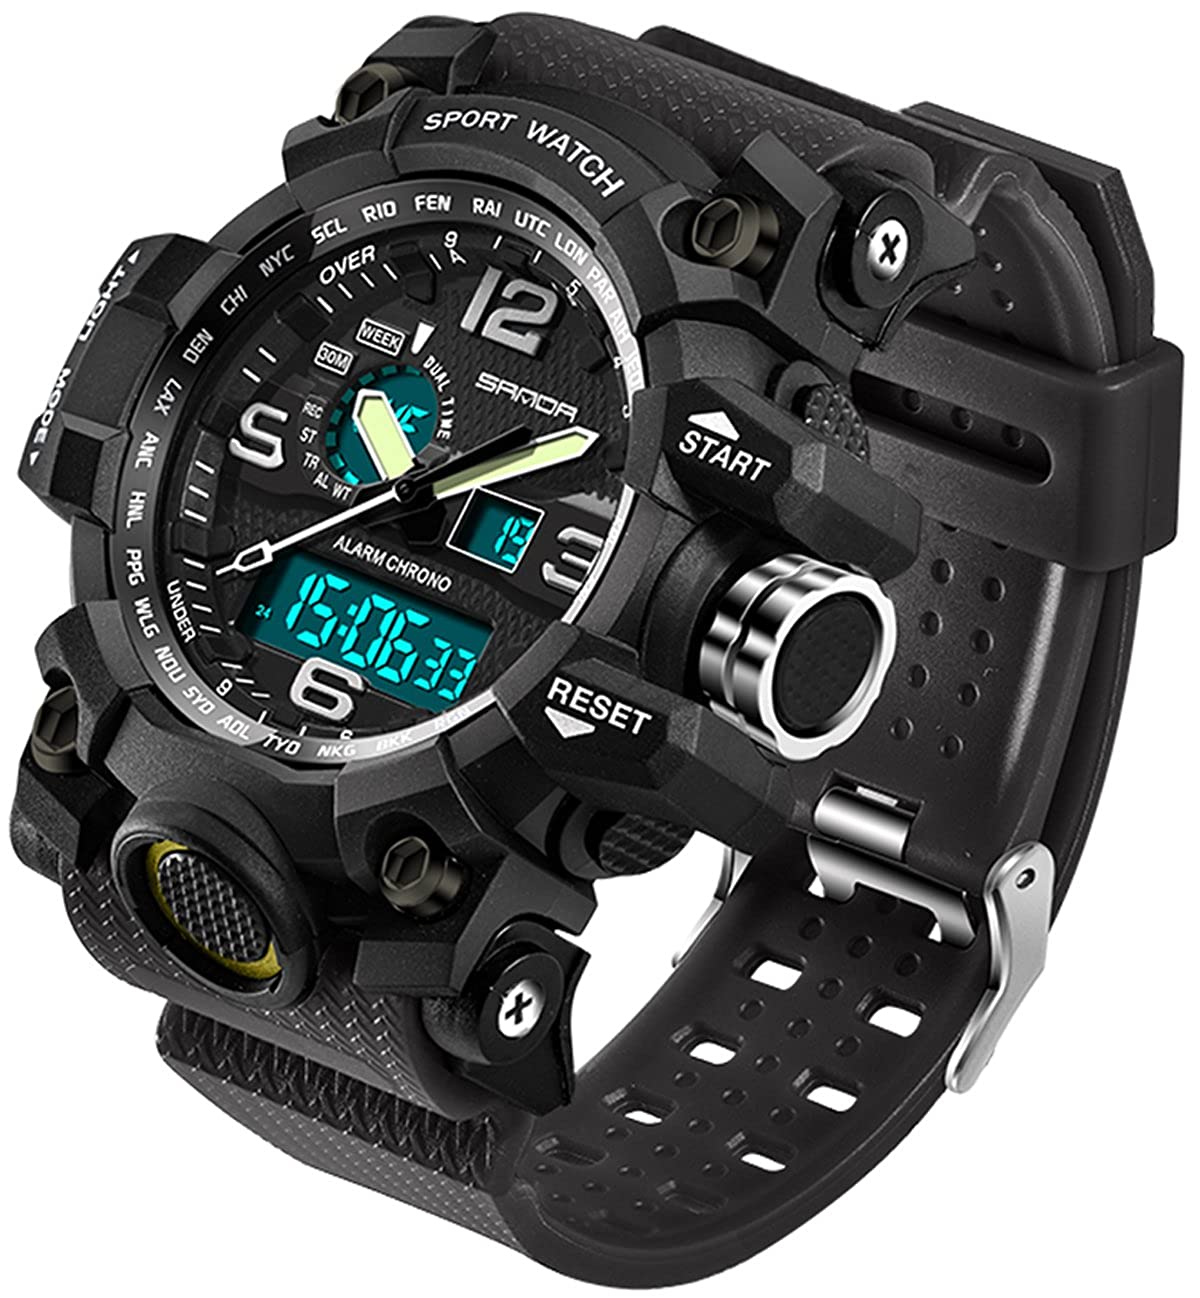 Relojes de Hombre Deportes Militares Electrónico Impermeable LED Cronómetro Digital Analógico Doble Pantalla Exterior Ejército Muñequera Reloj Táctico